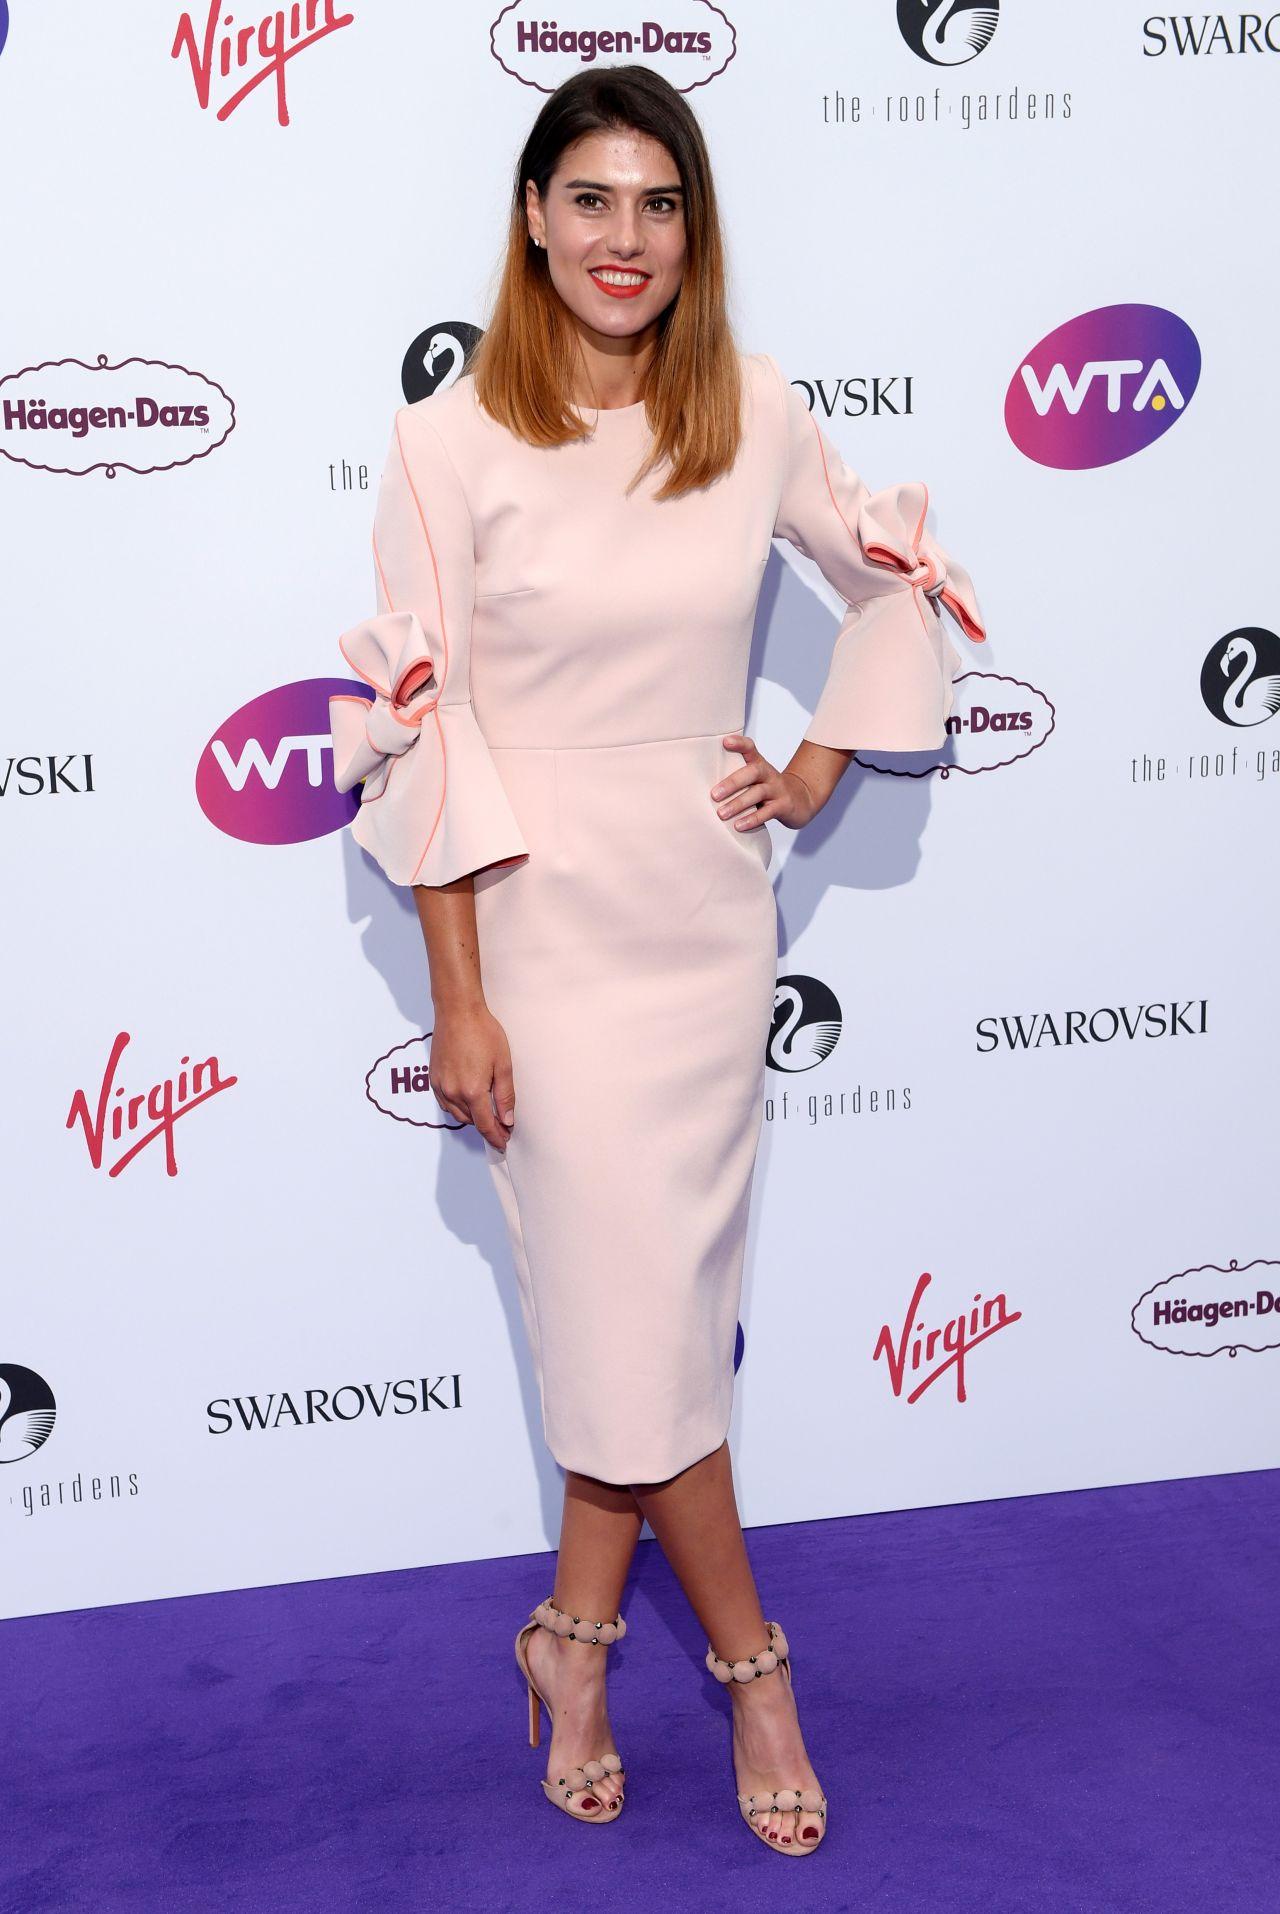 Sorana Cirstea Wta Pre Wimbledon Party In London 06 29 2017